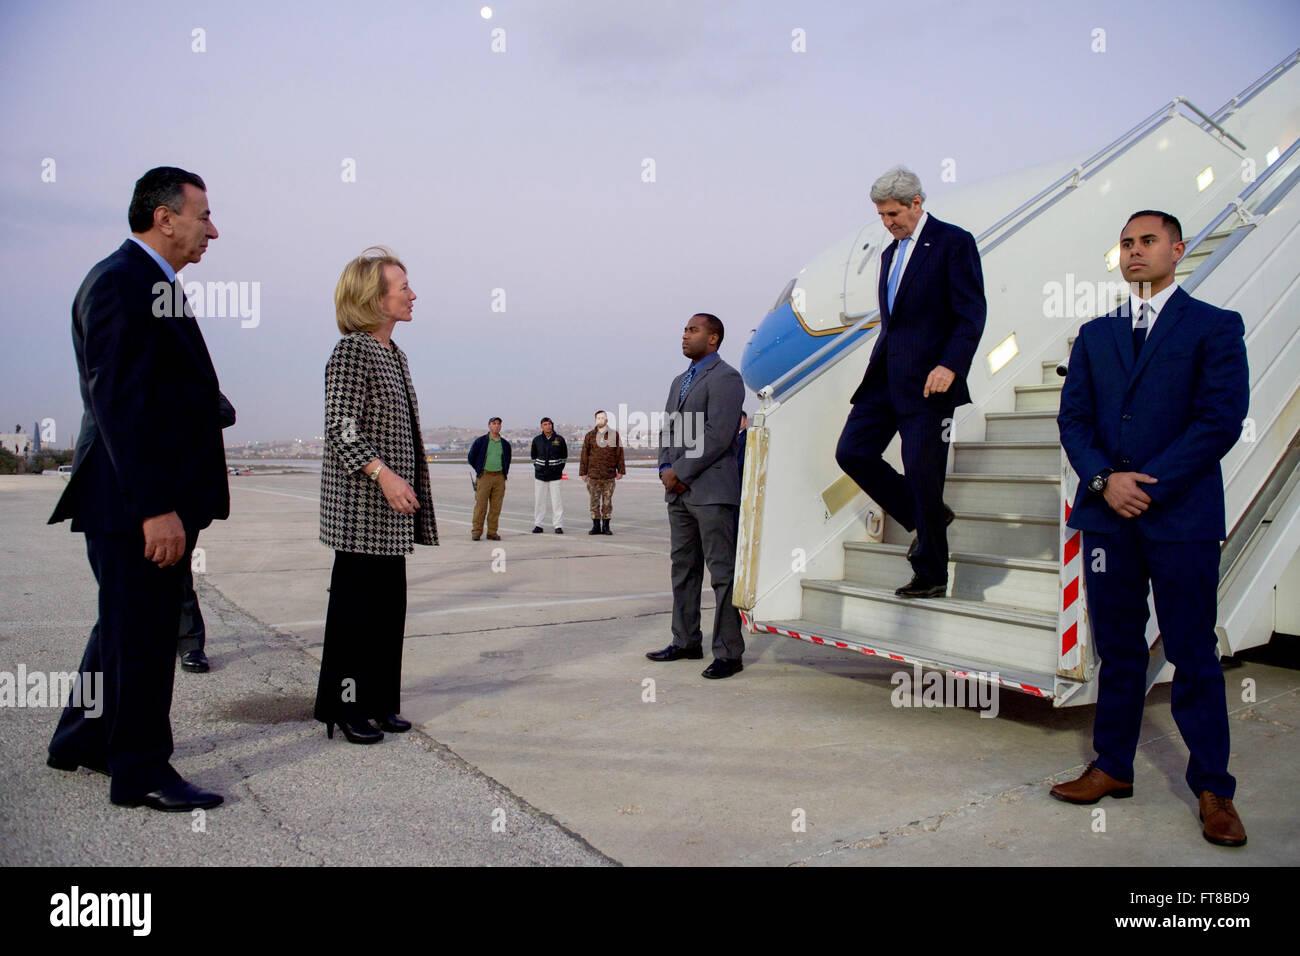 U.S. Ambassador to Jordan Alice Wells stands under a near-full moon as she awaits U.S. Secretary of State John Kerry - Stock Image